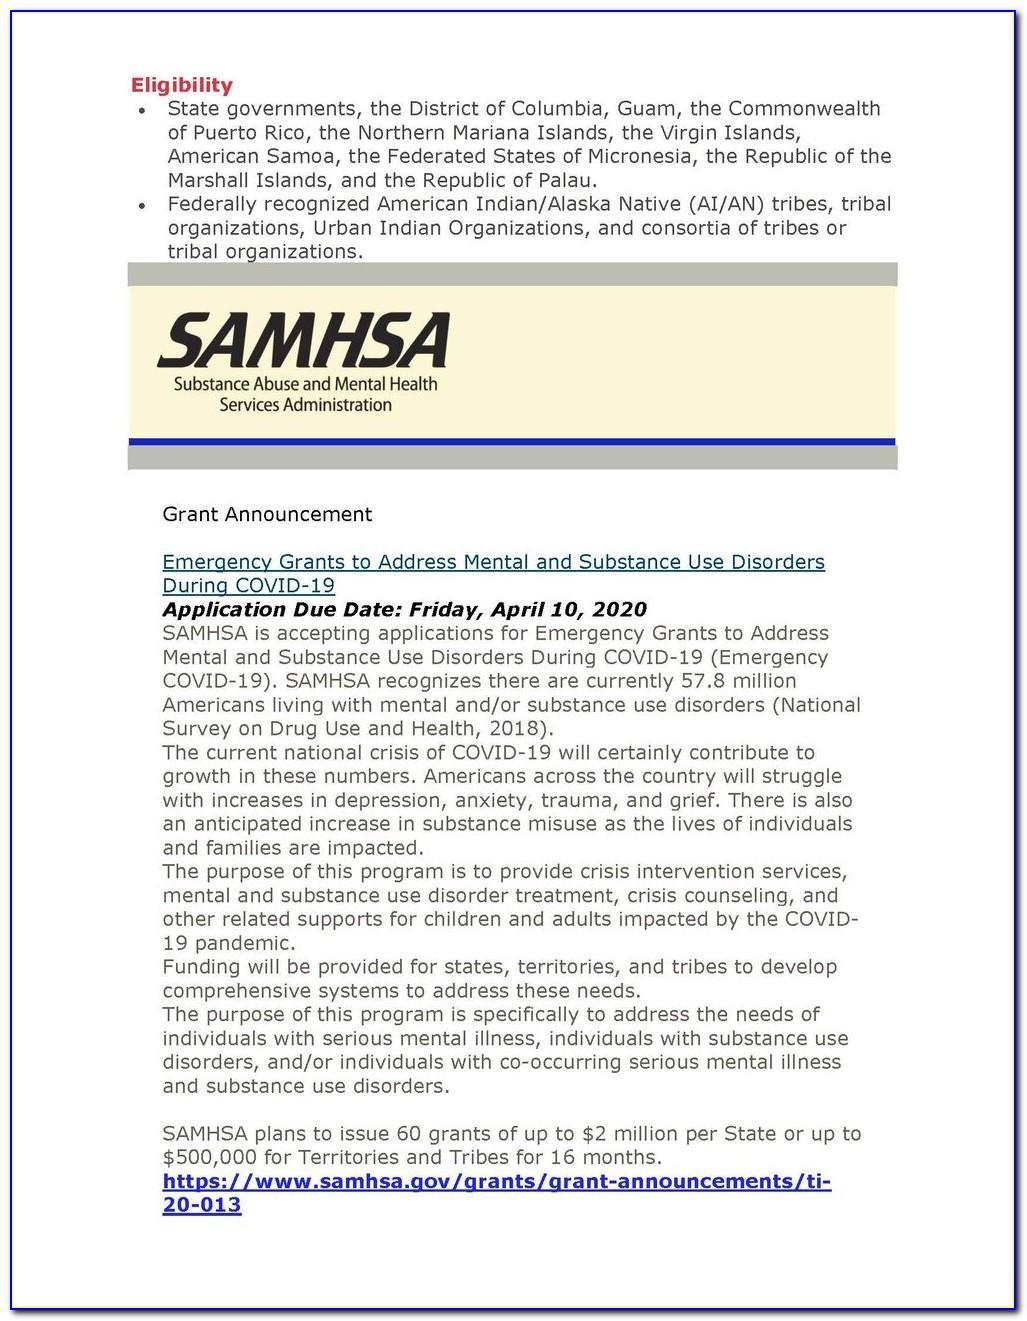 Samhsa Grant Announcements 2020